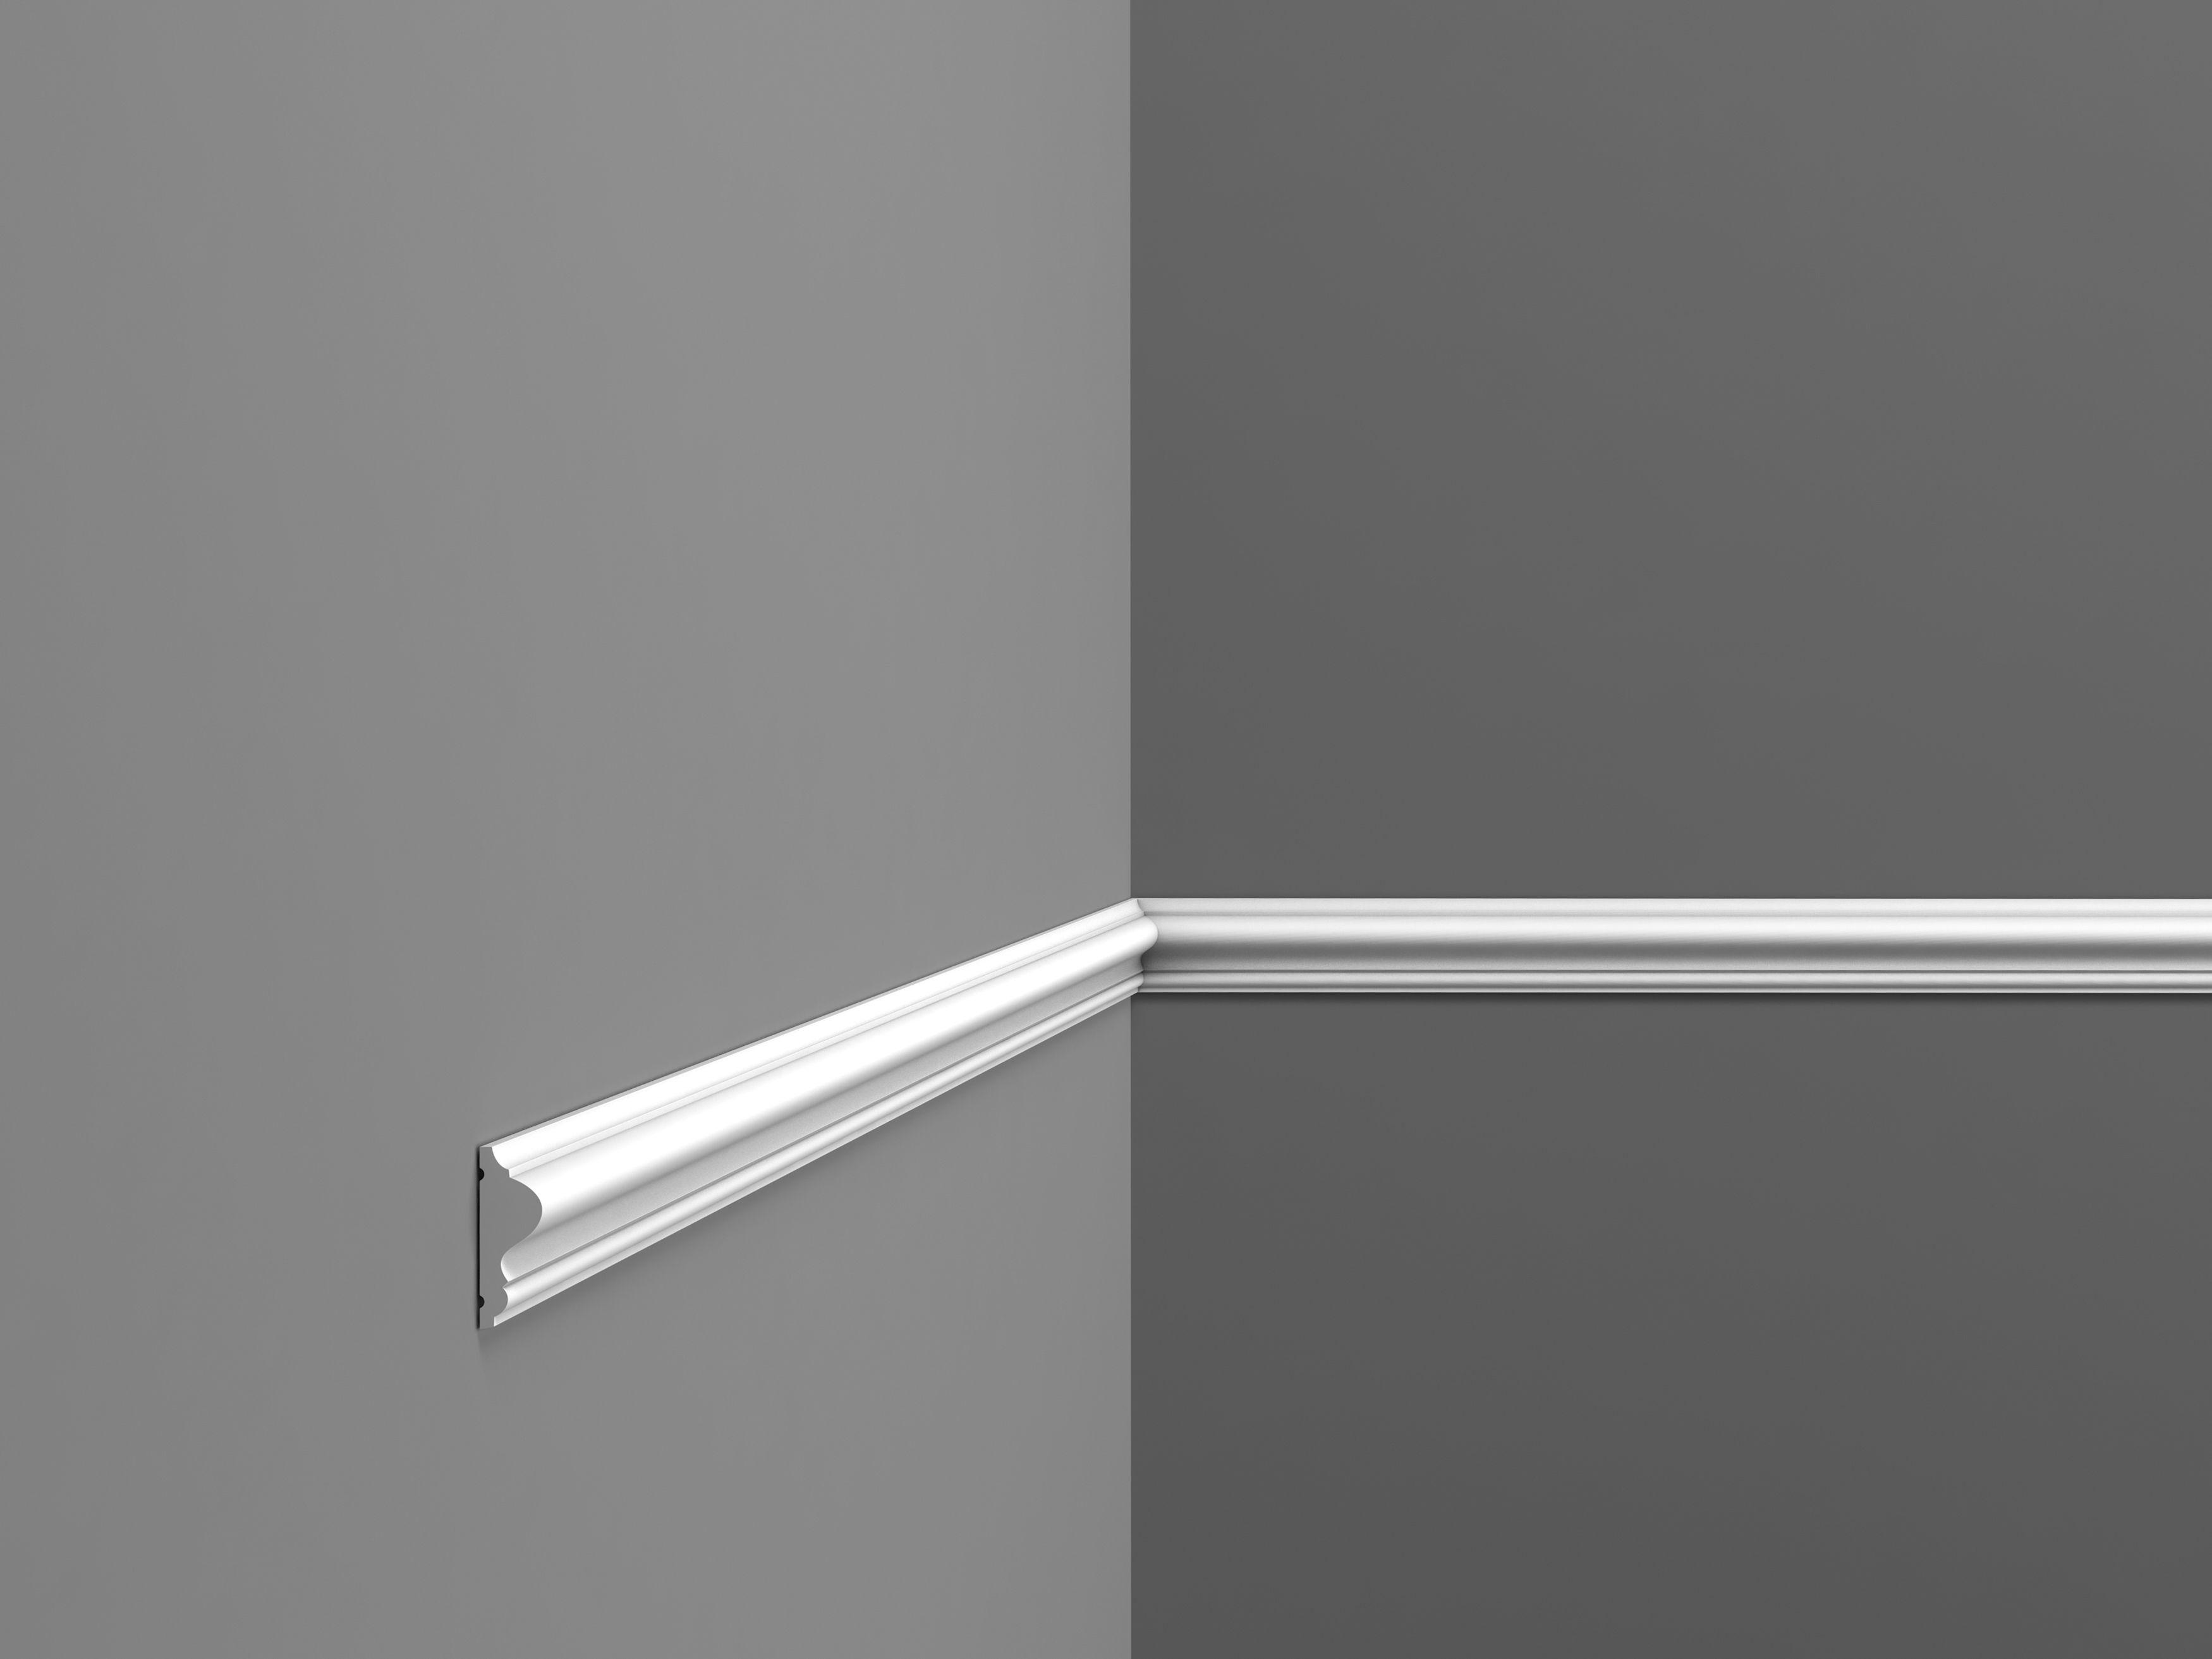 Px175 Cimaise Duropolymer Orac Decor Axxent 5×1 7cm H X P